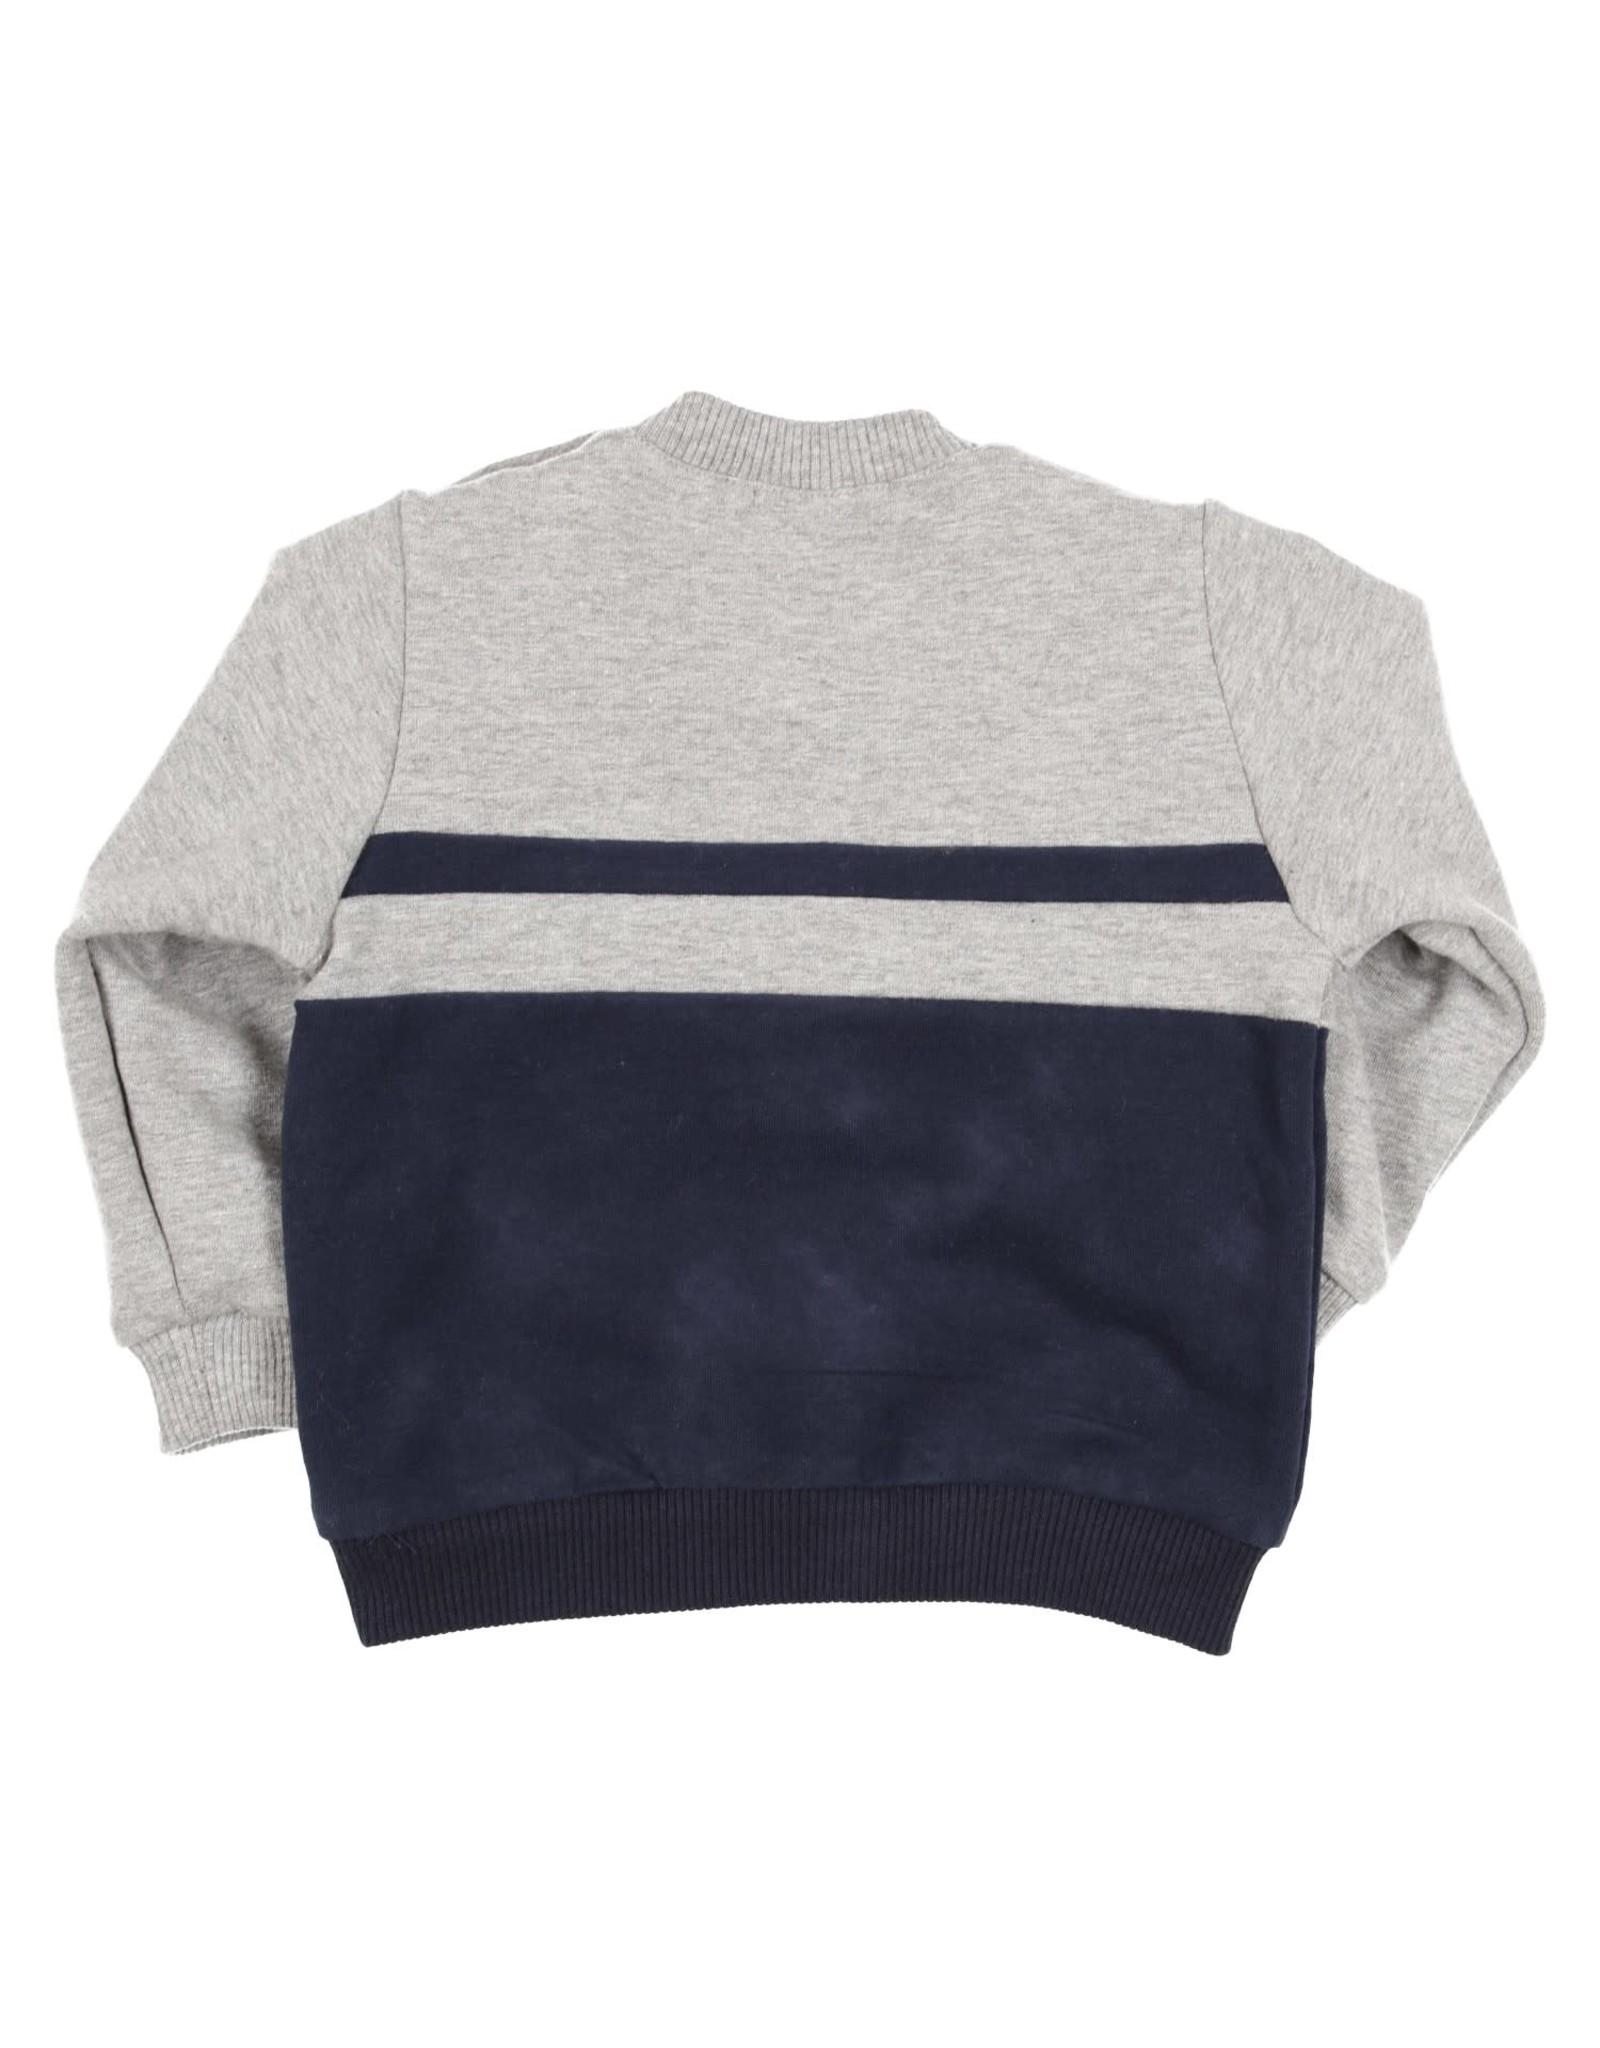 Gymp Carbonchine Sweater stripe - Grijs/Marine